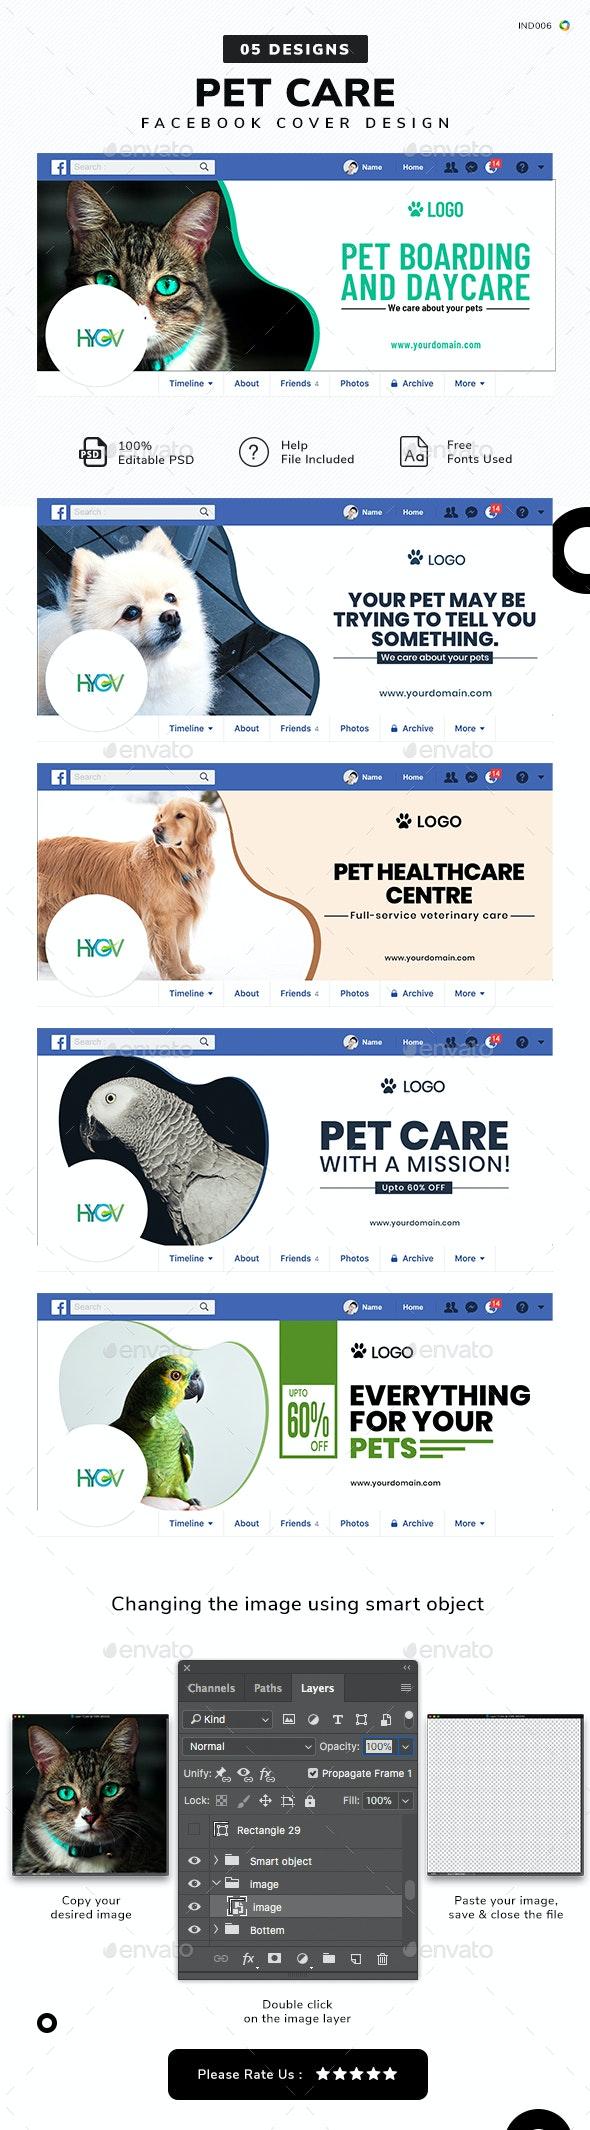 Pet Care Facebook Cover Templates - 05 Designs - Facebook Timeline Covers Social Media